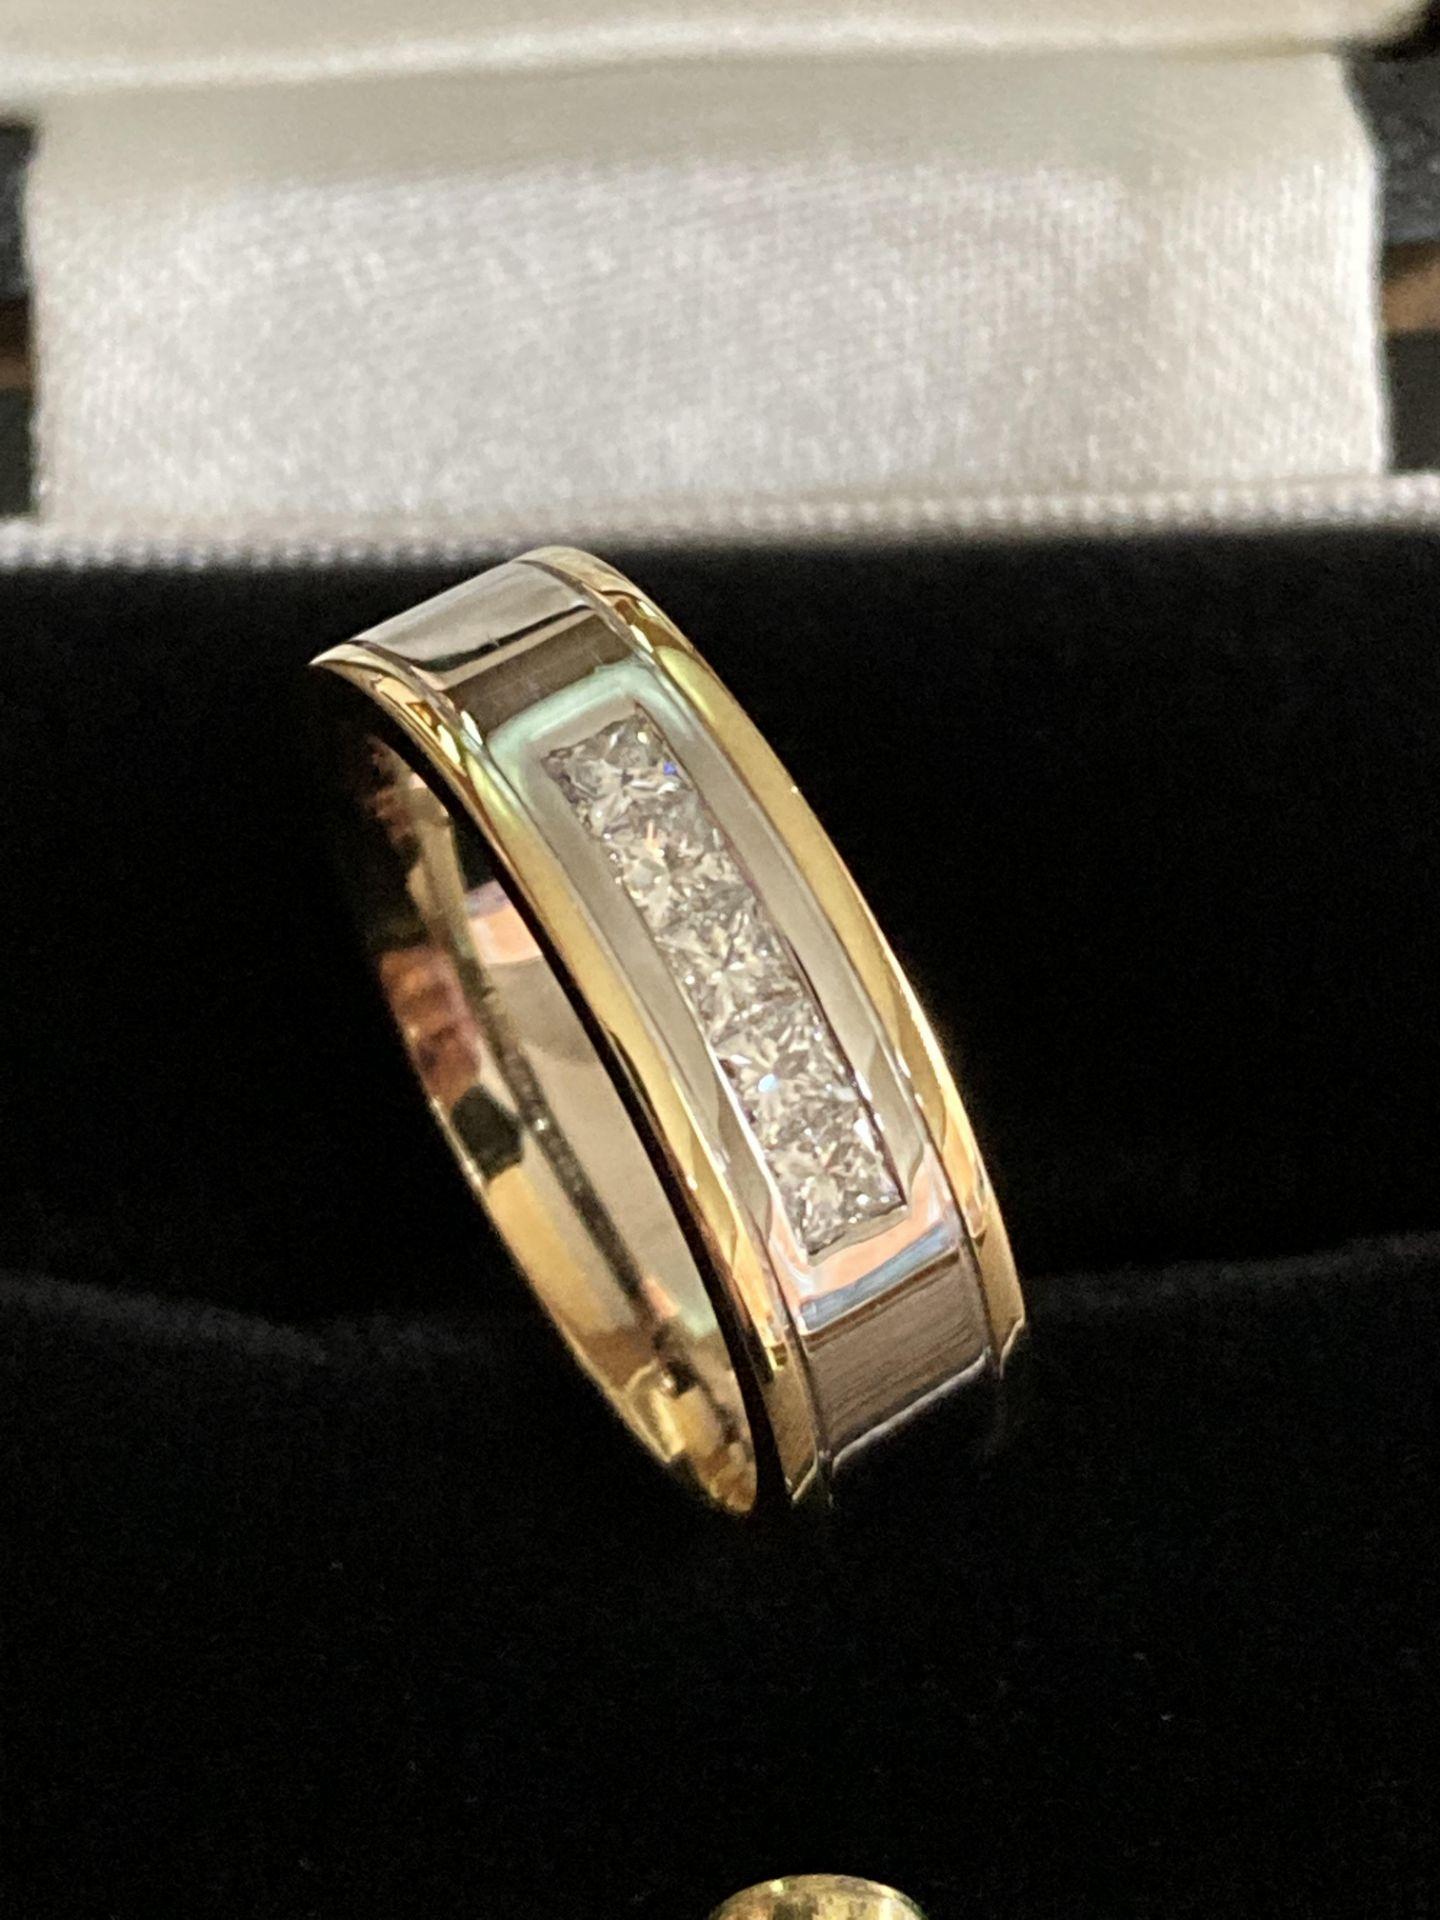 18CT MIXED GOLD DIAMOND RING (PRINCESS CUT) - SIZE: O 1/2 / WEIGHT: 8.9G - Image 2 of 3